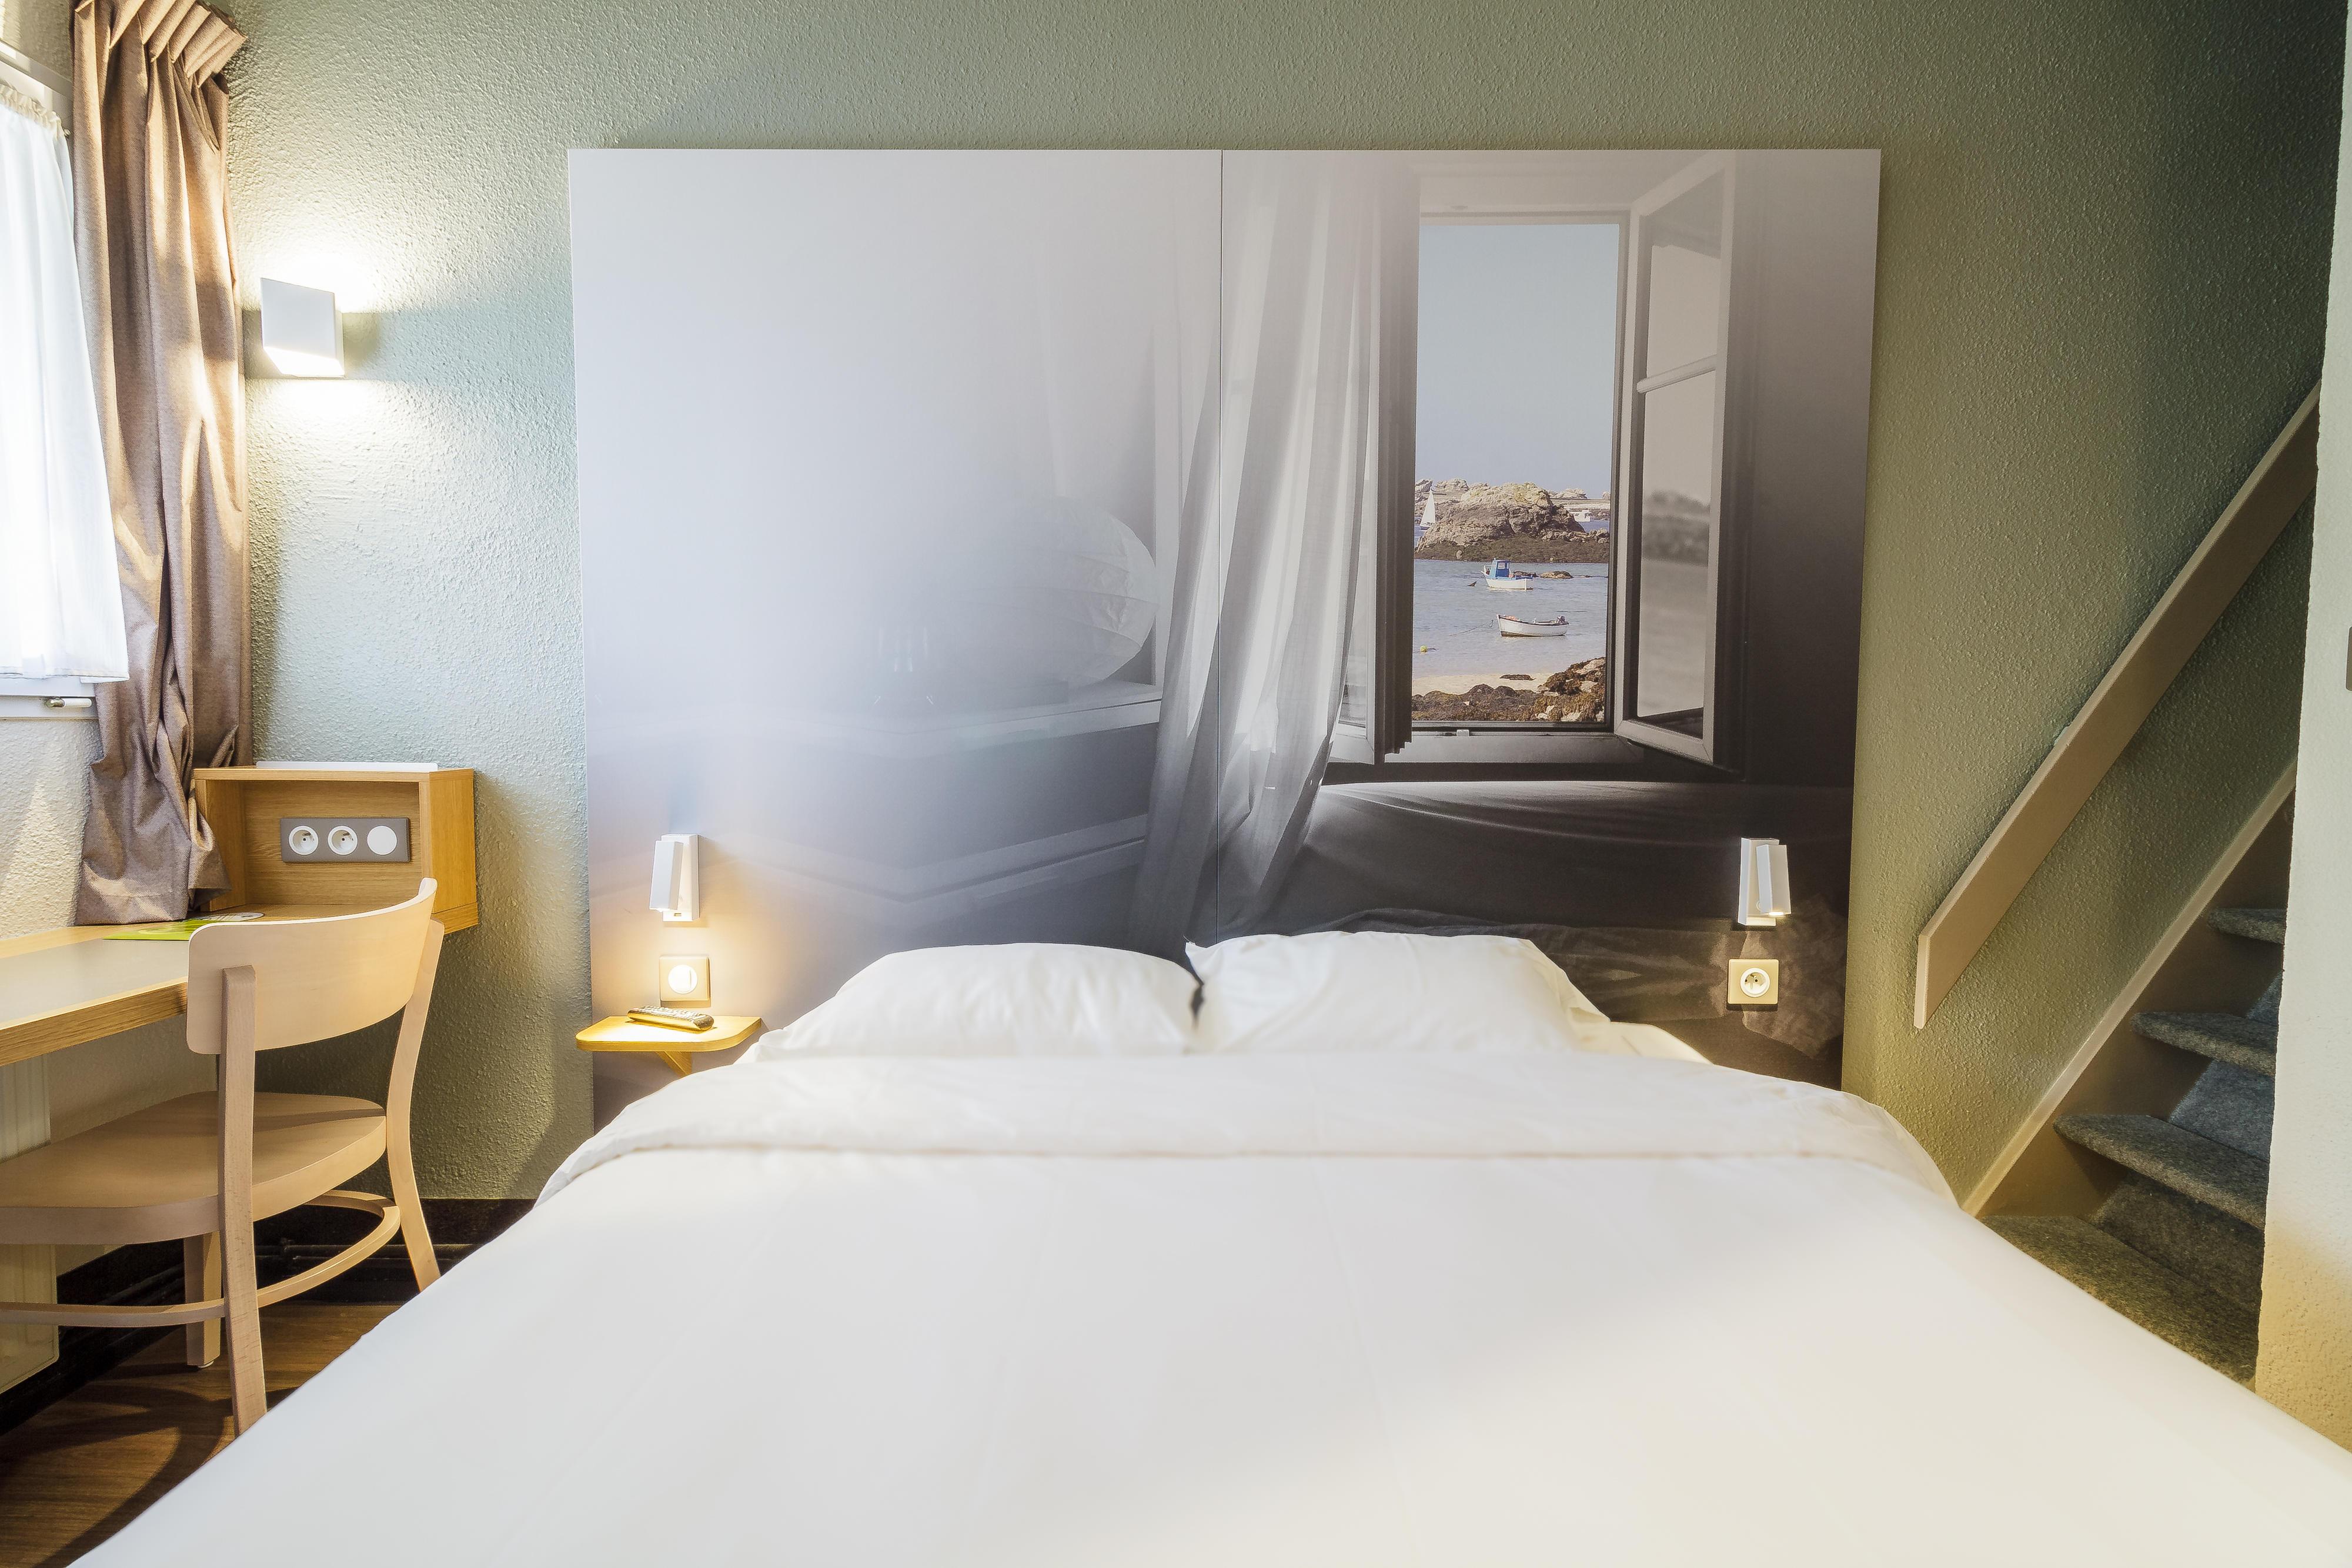 b b hotel morlaix saint martin des champs 29600 rue ar brug za du launay adresse. Black Bedroom Furniture Sets. Home Design Ideas